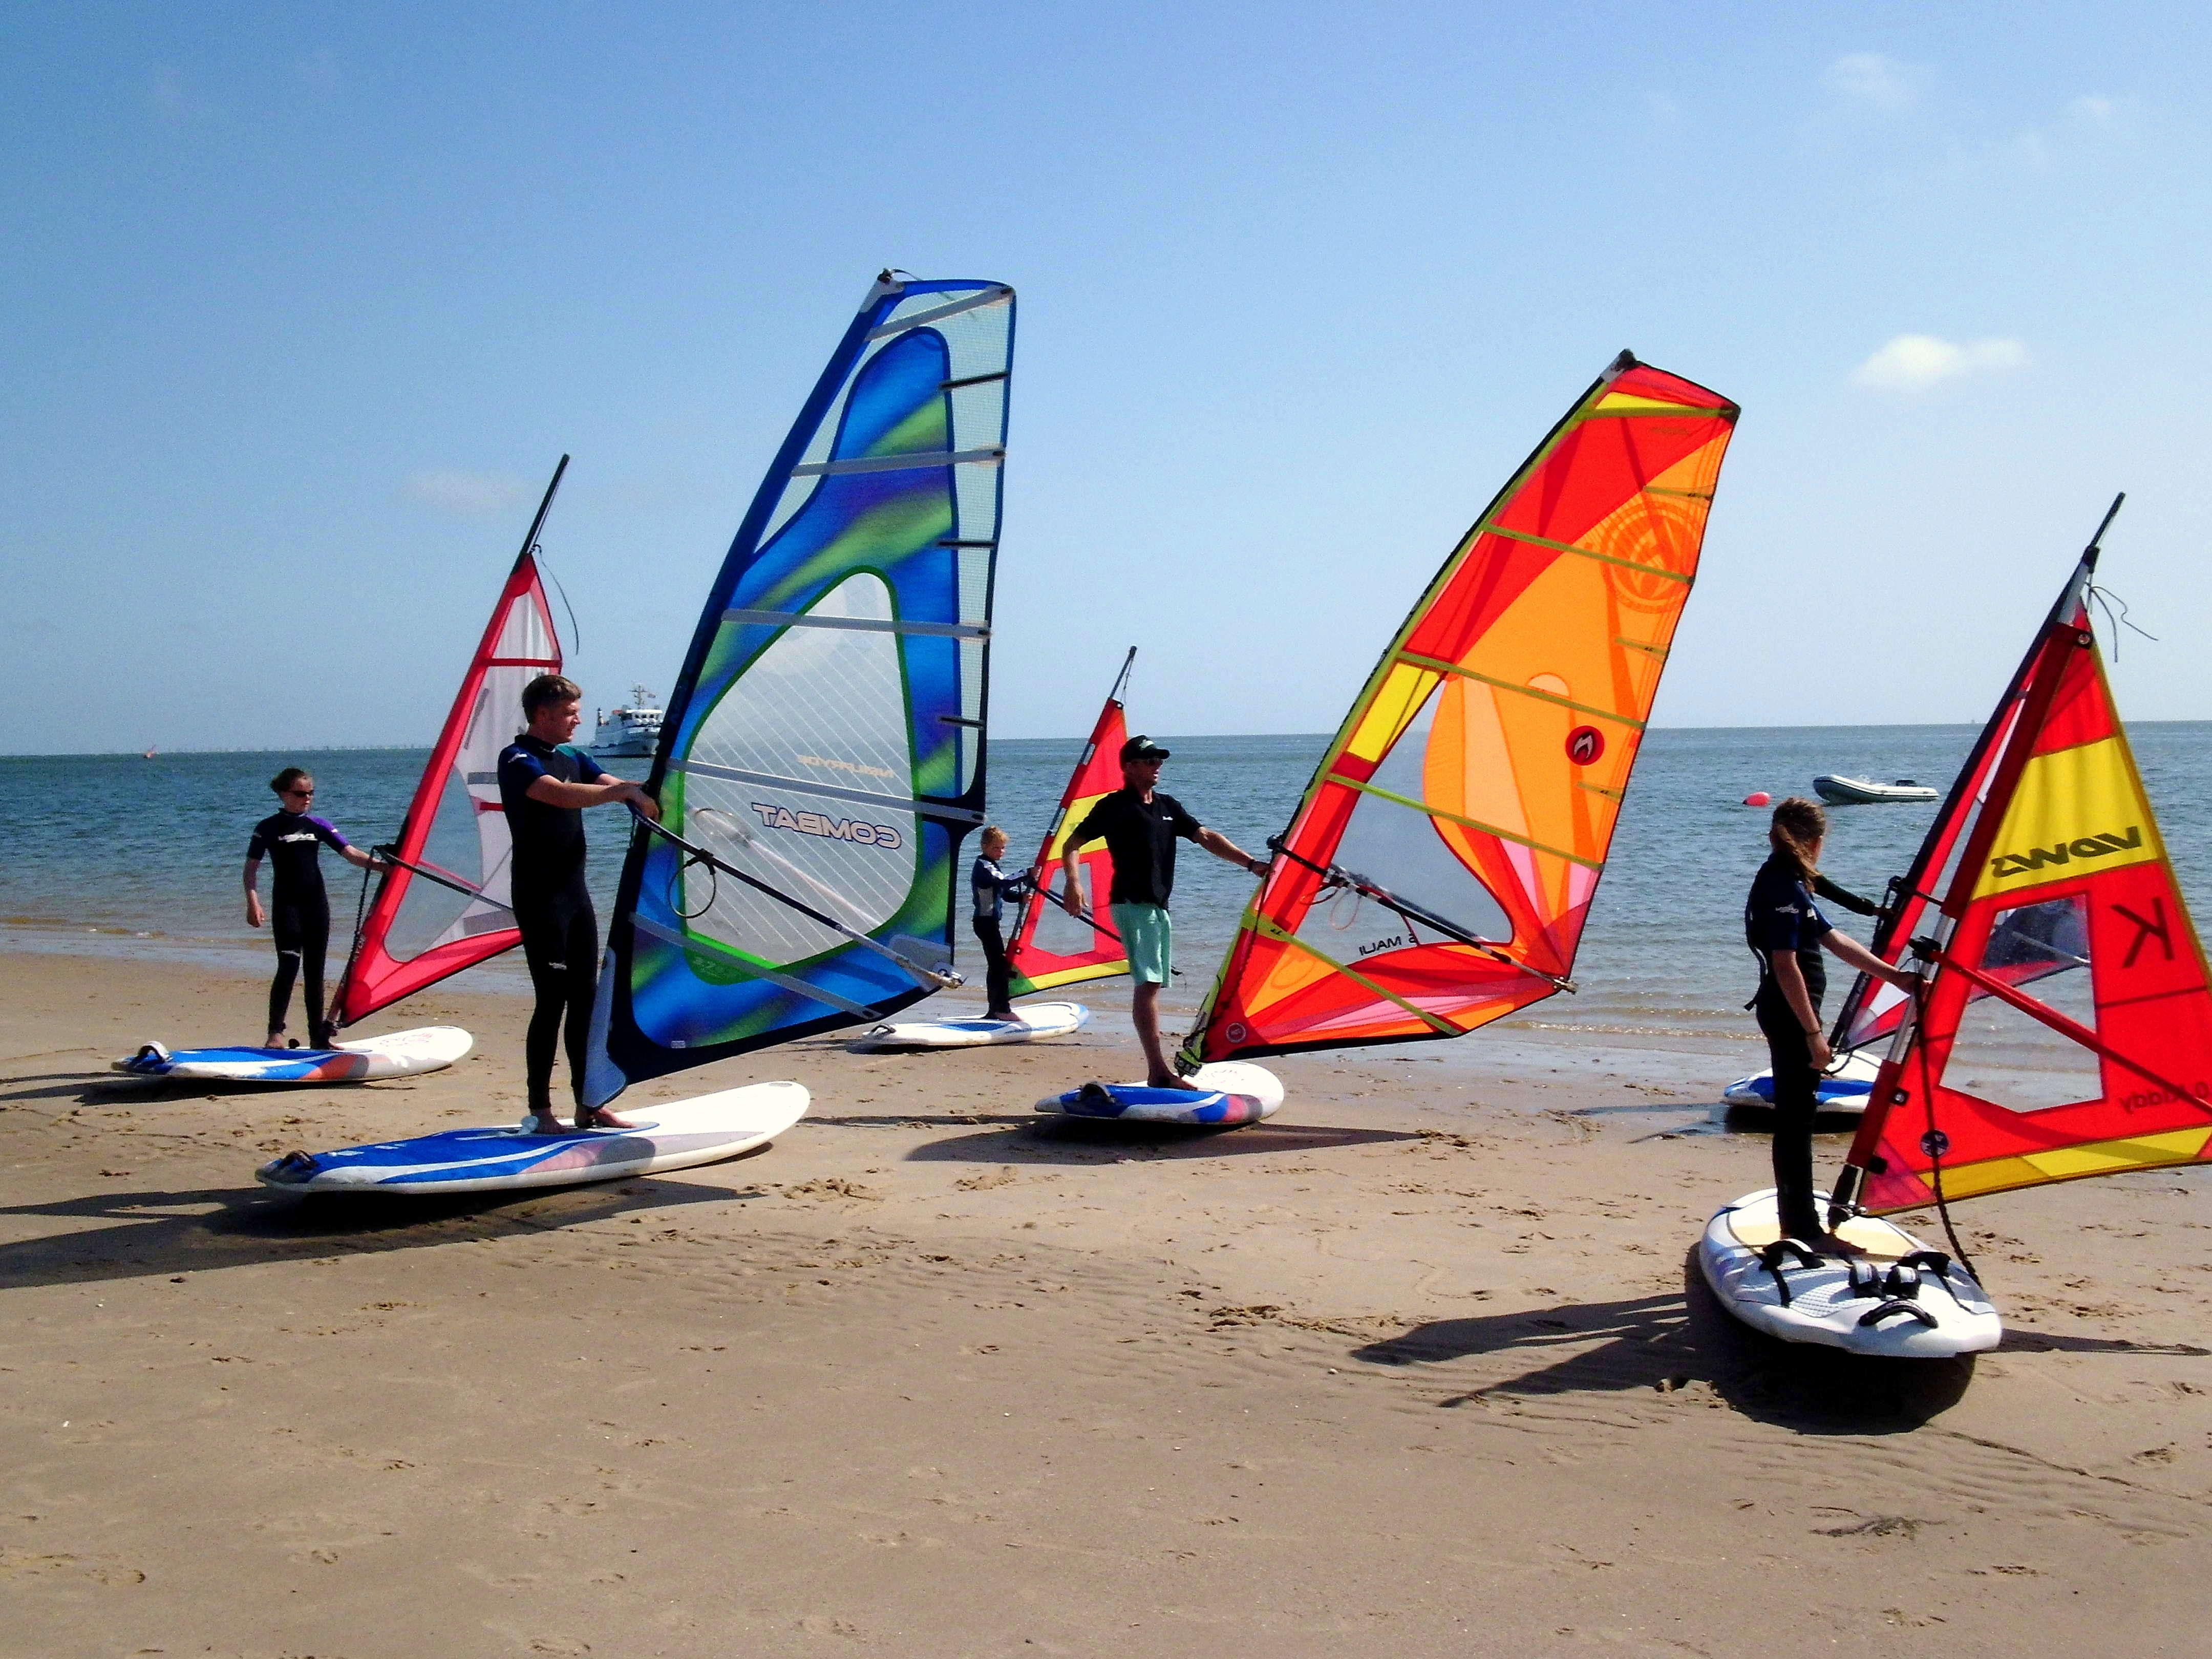 Windsurfen lernen Sylt - Südkap Surfing auf Sylt